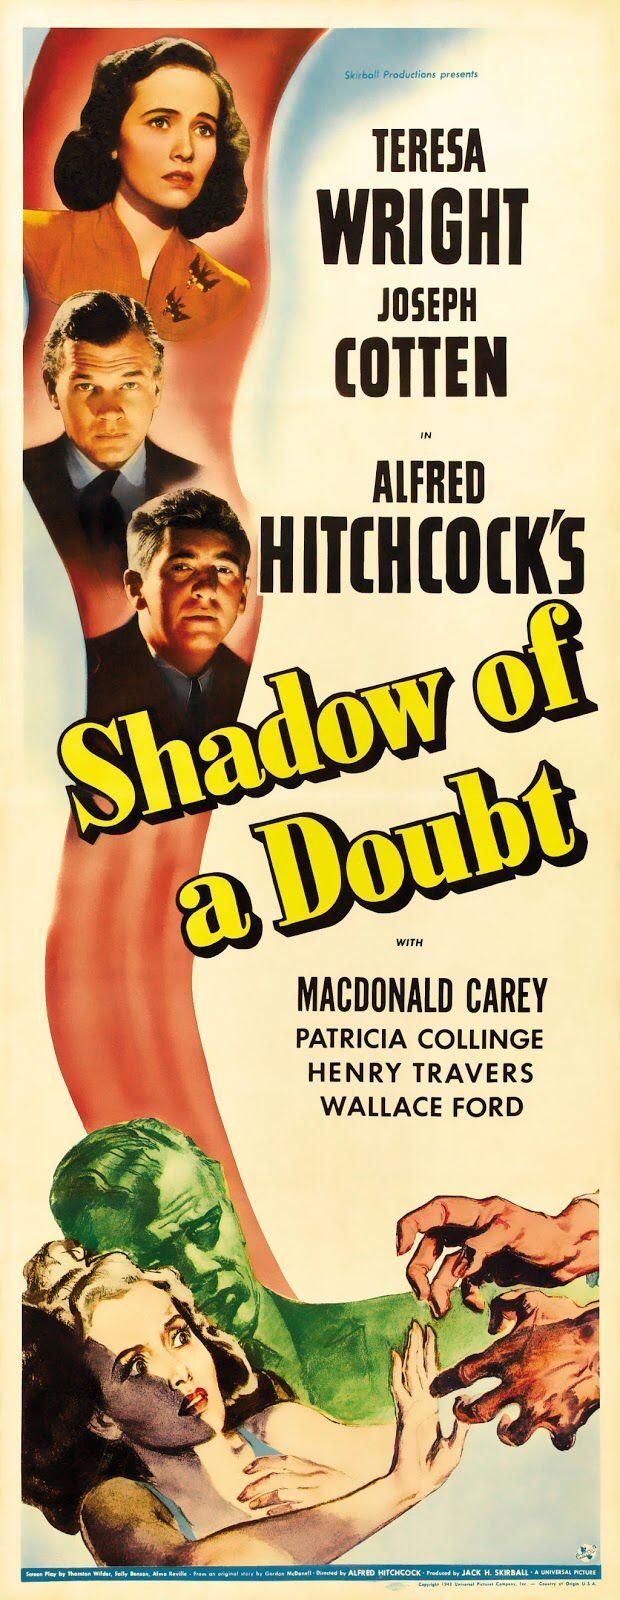 Shadow of a Doubt (1943) Teresa Wright, Joseph Cotten, Macdonald Carey, Patricia Collinge, Henry Travers